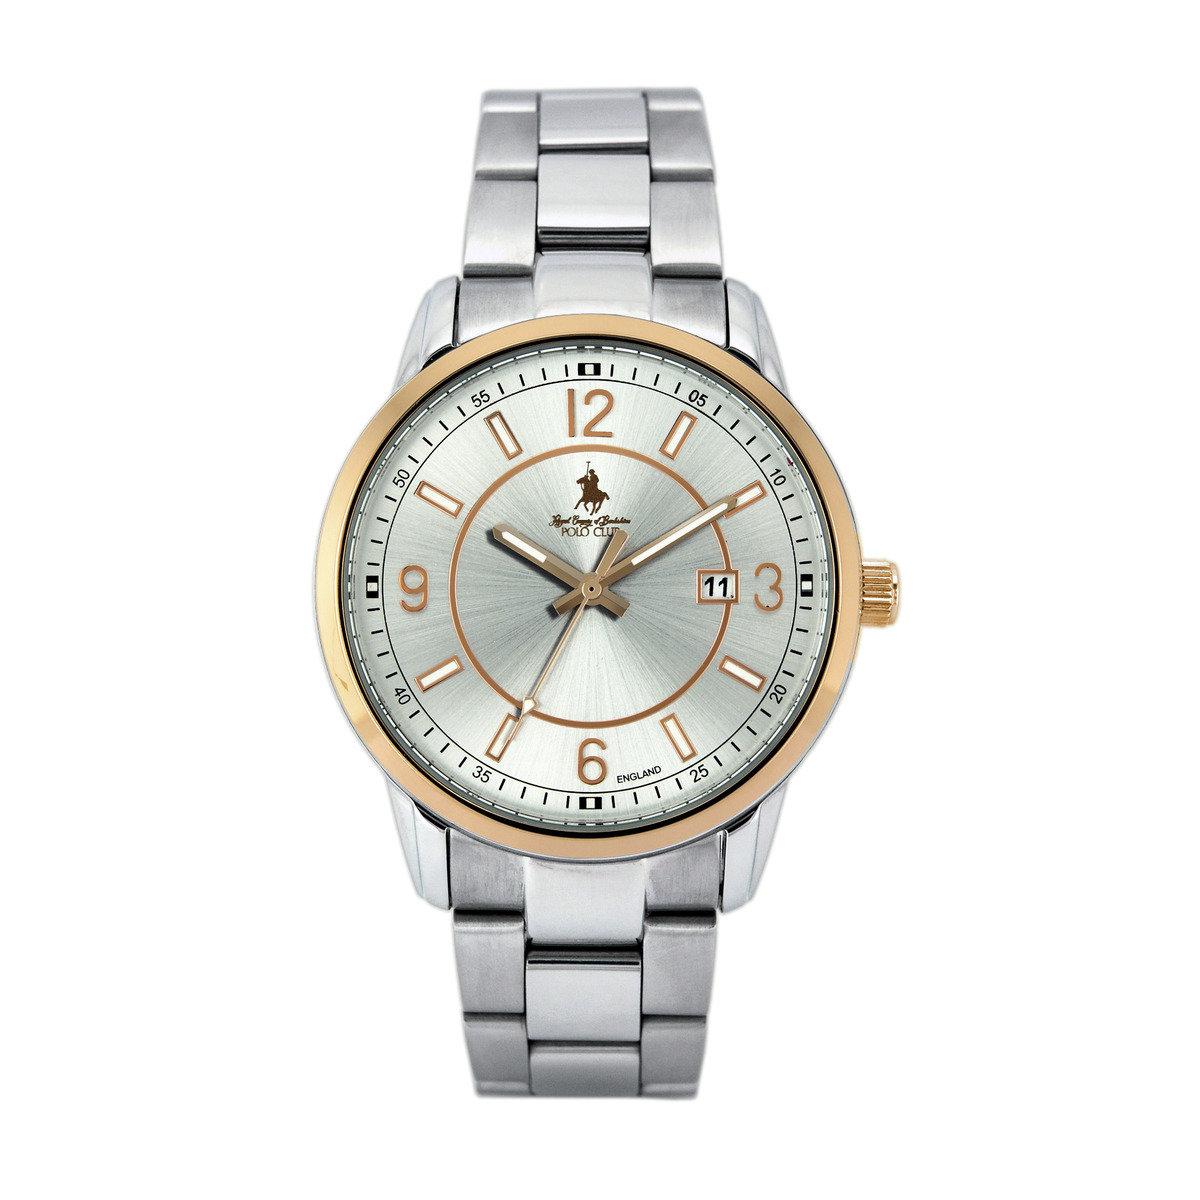 PL219-963RG-B Watch